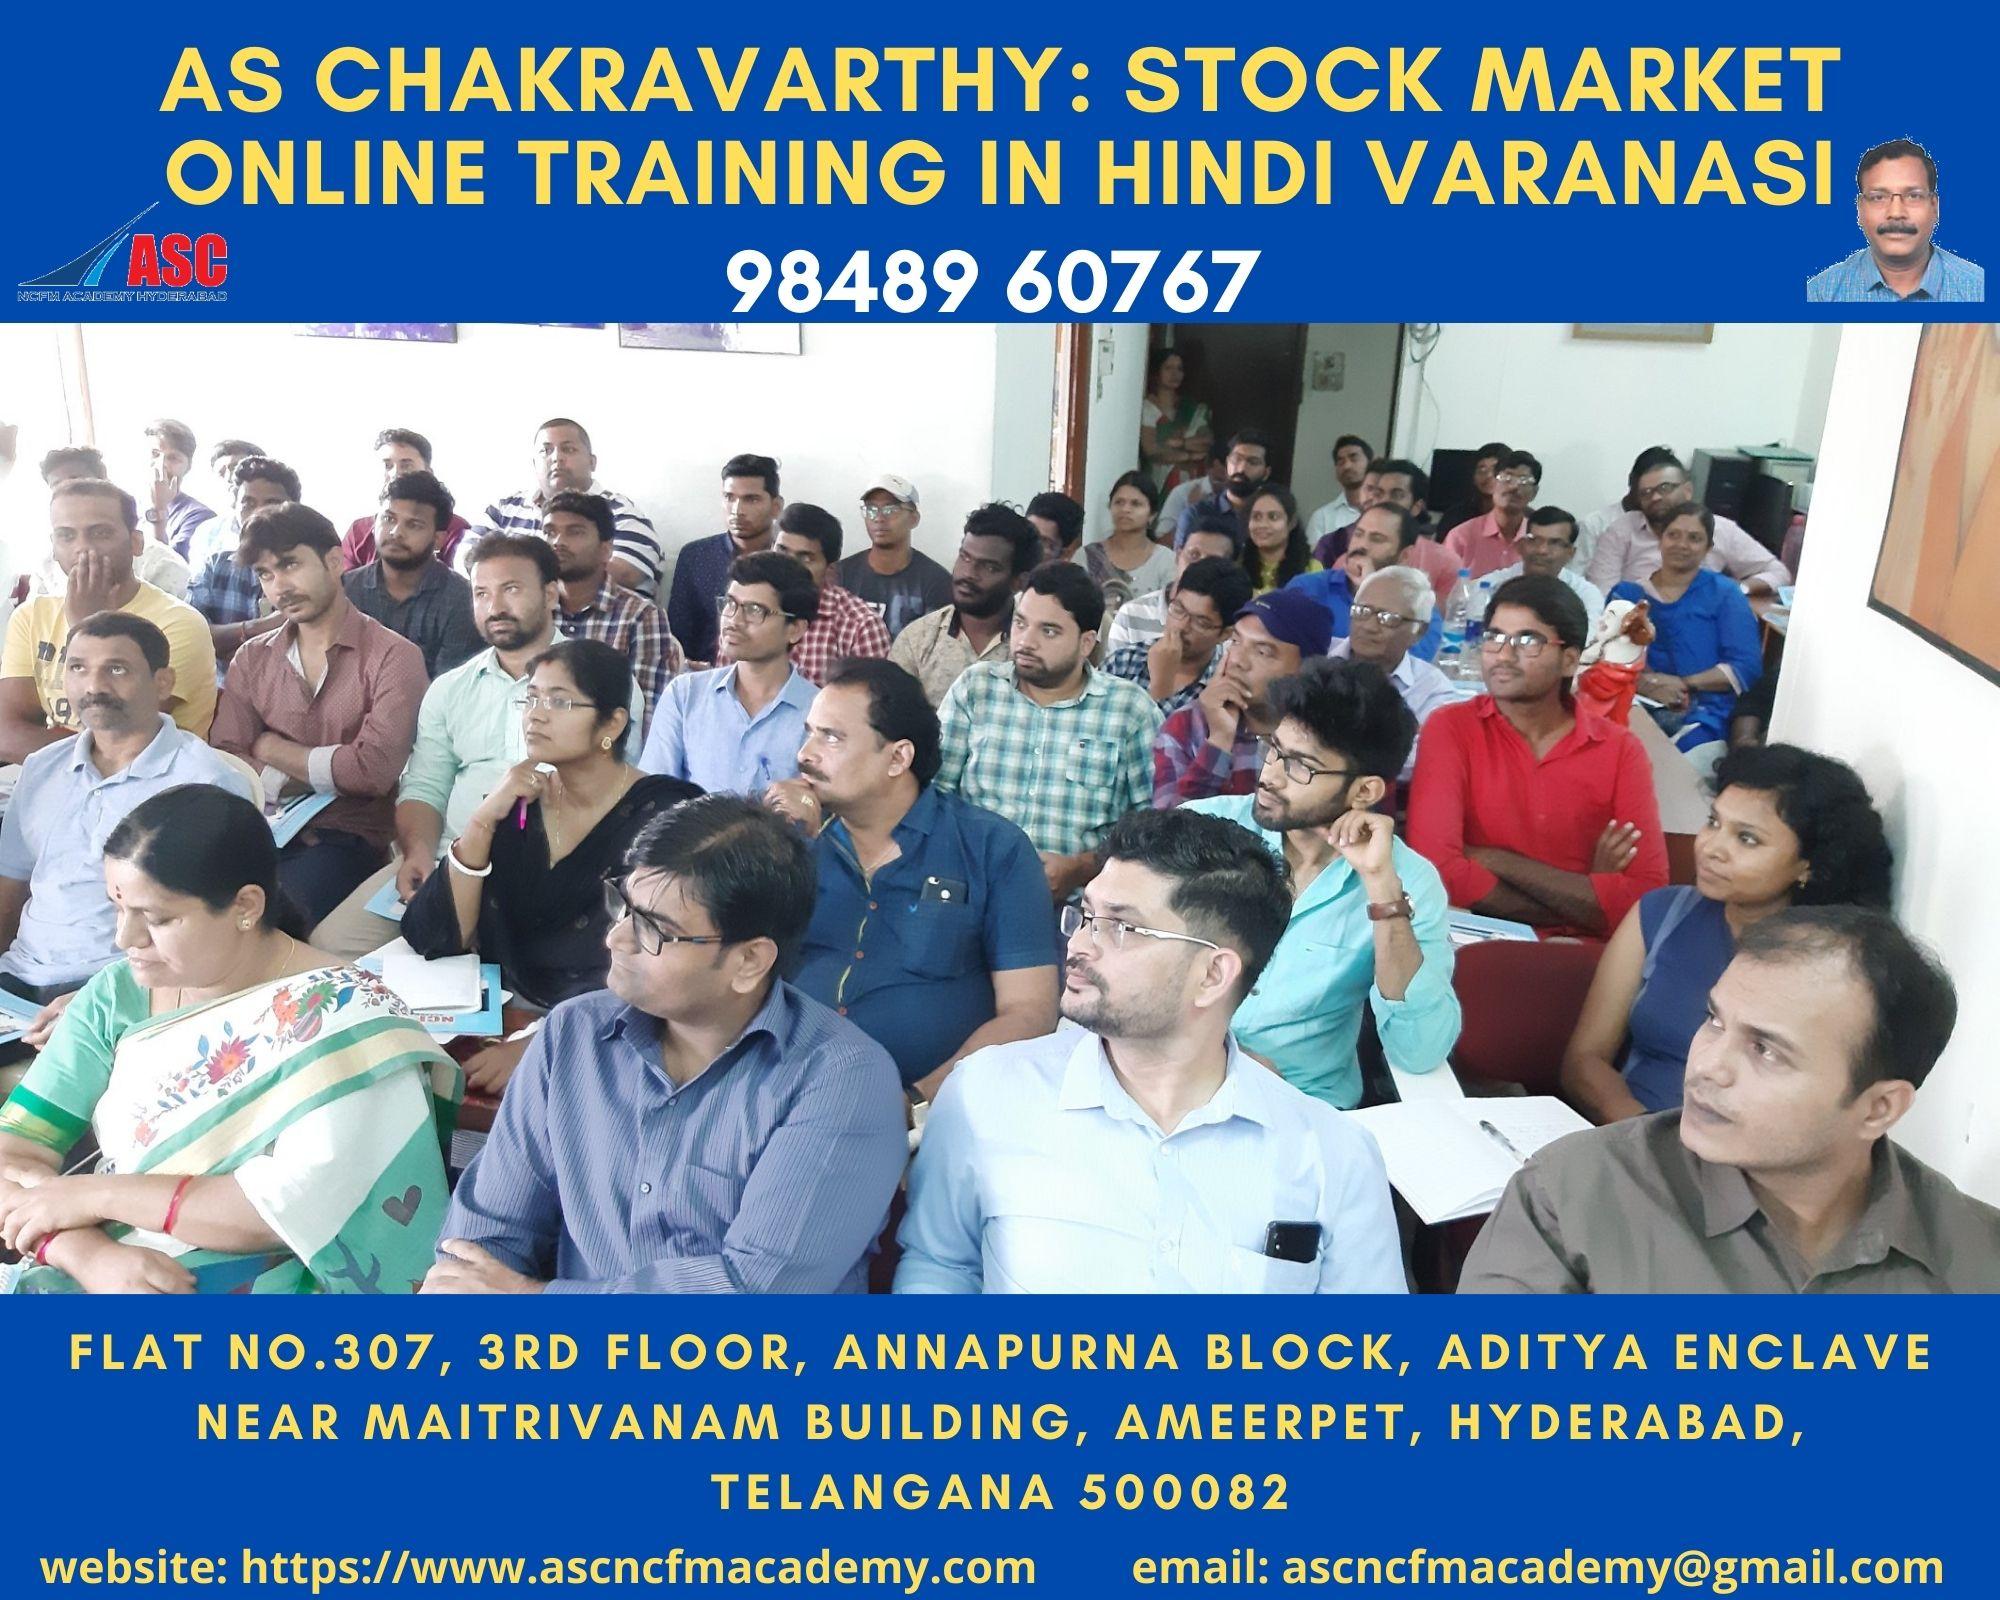 Online Stock Market Technical Training in Hindi Varanasi